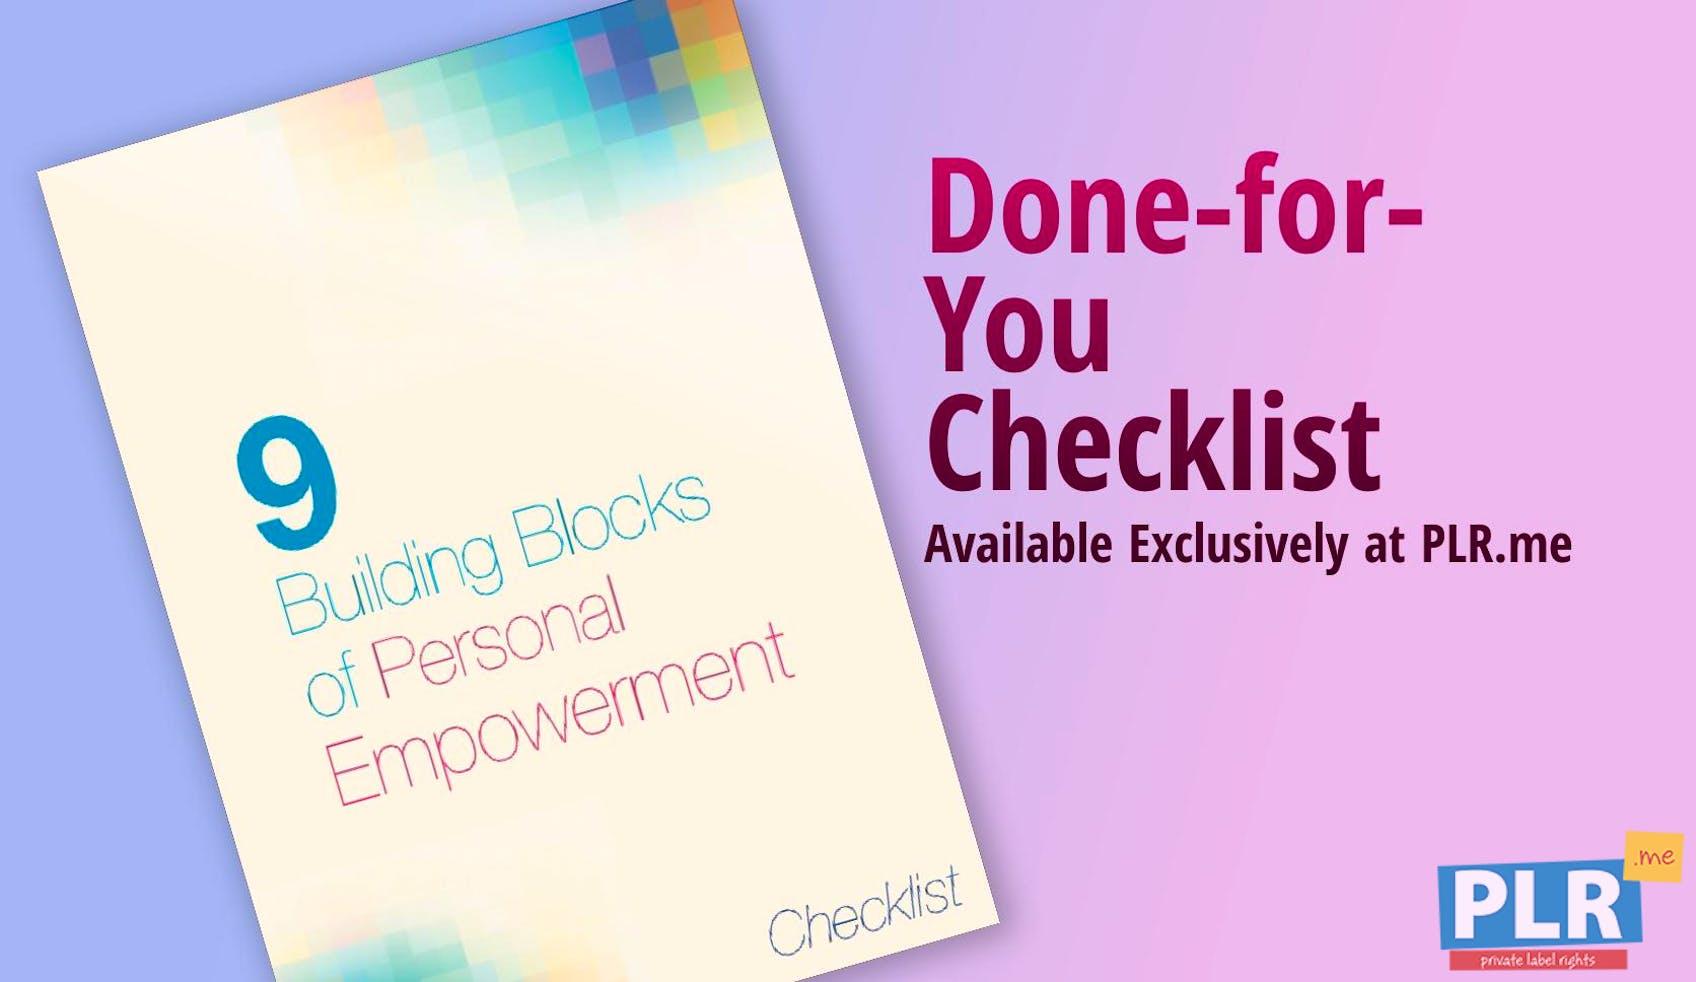 9 Building Blocks Of Personal Empowerment Checklist